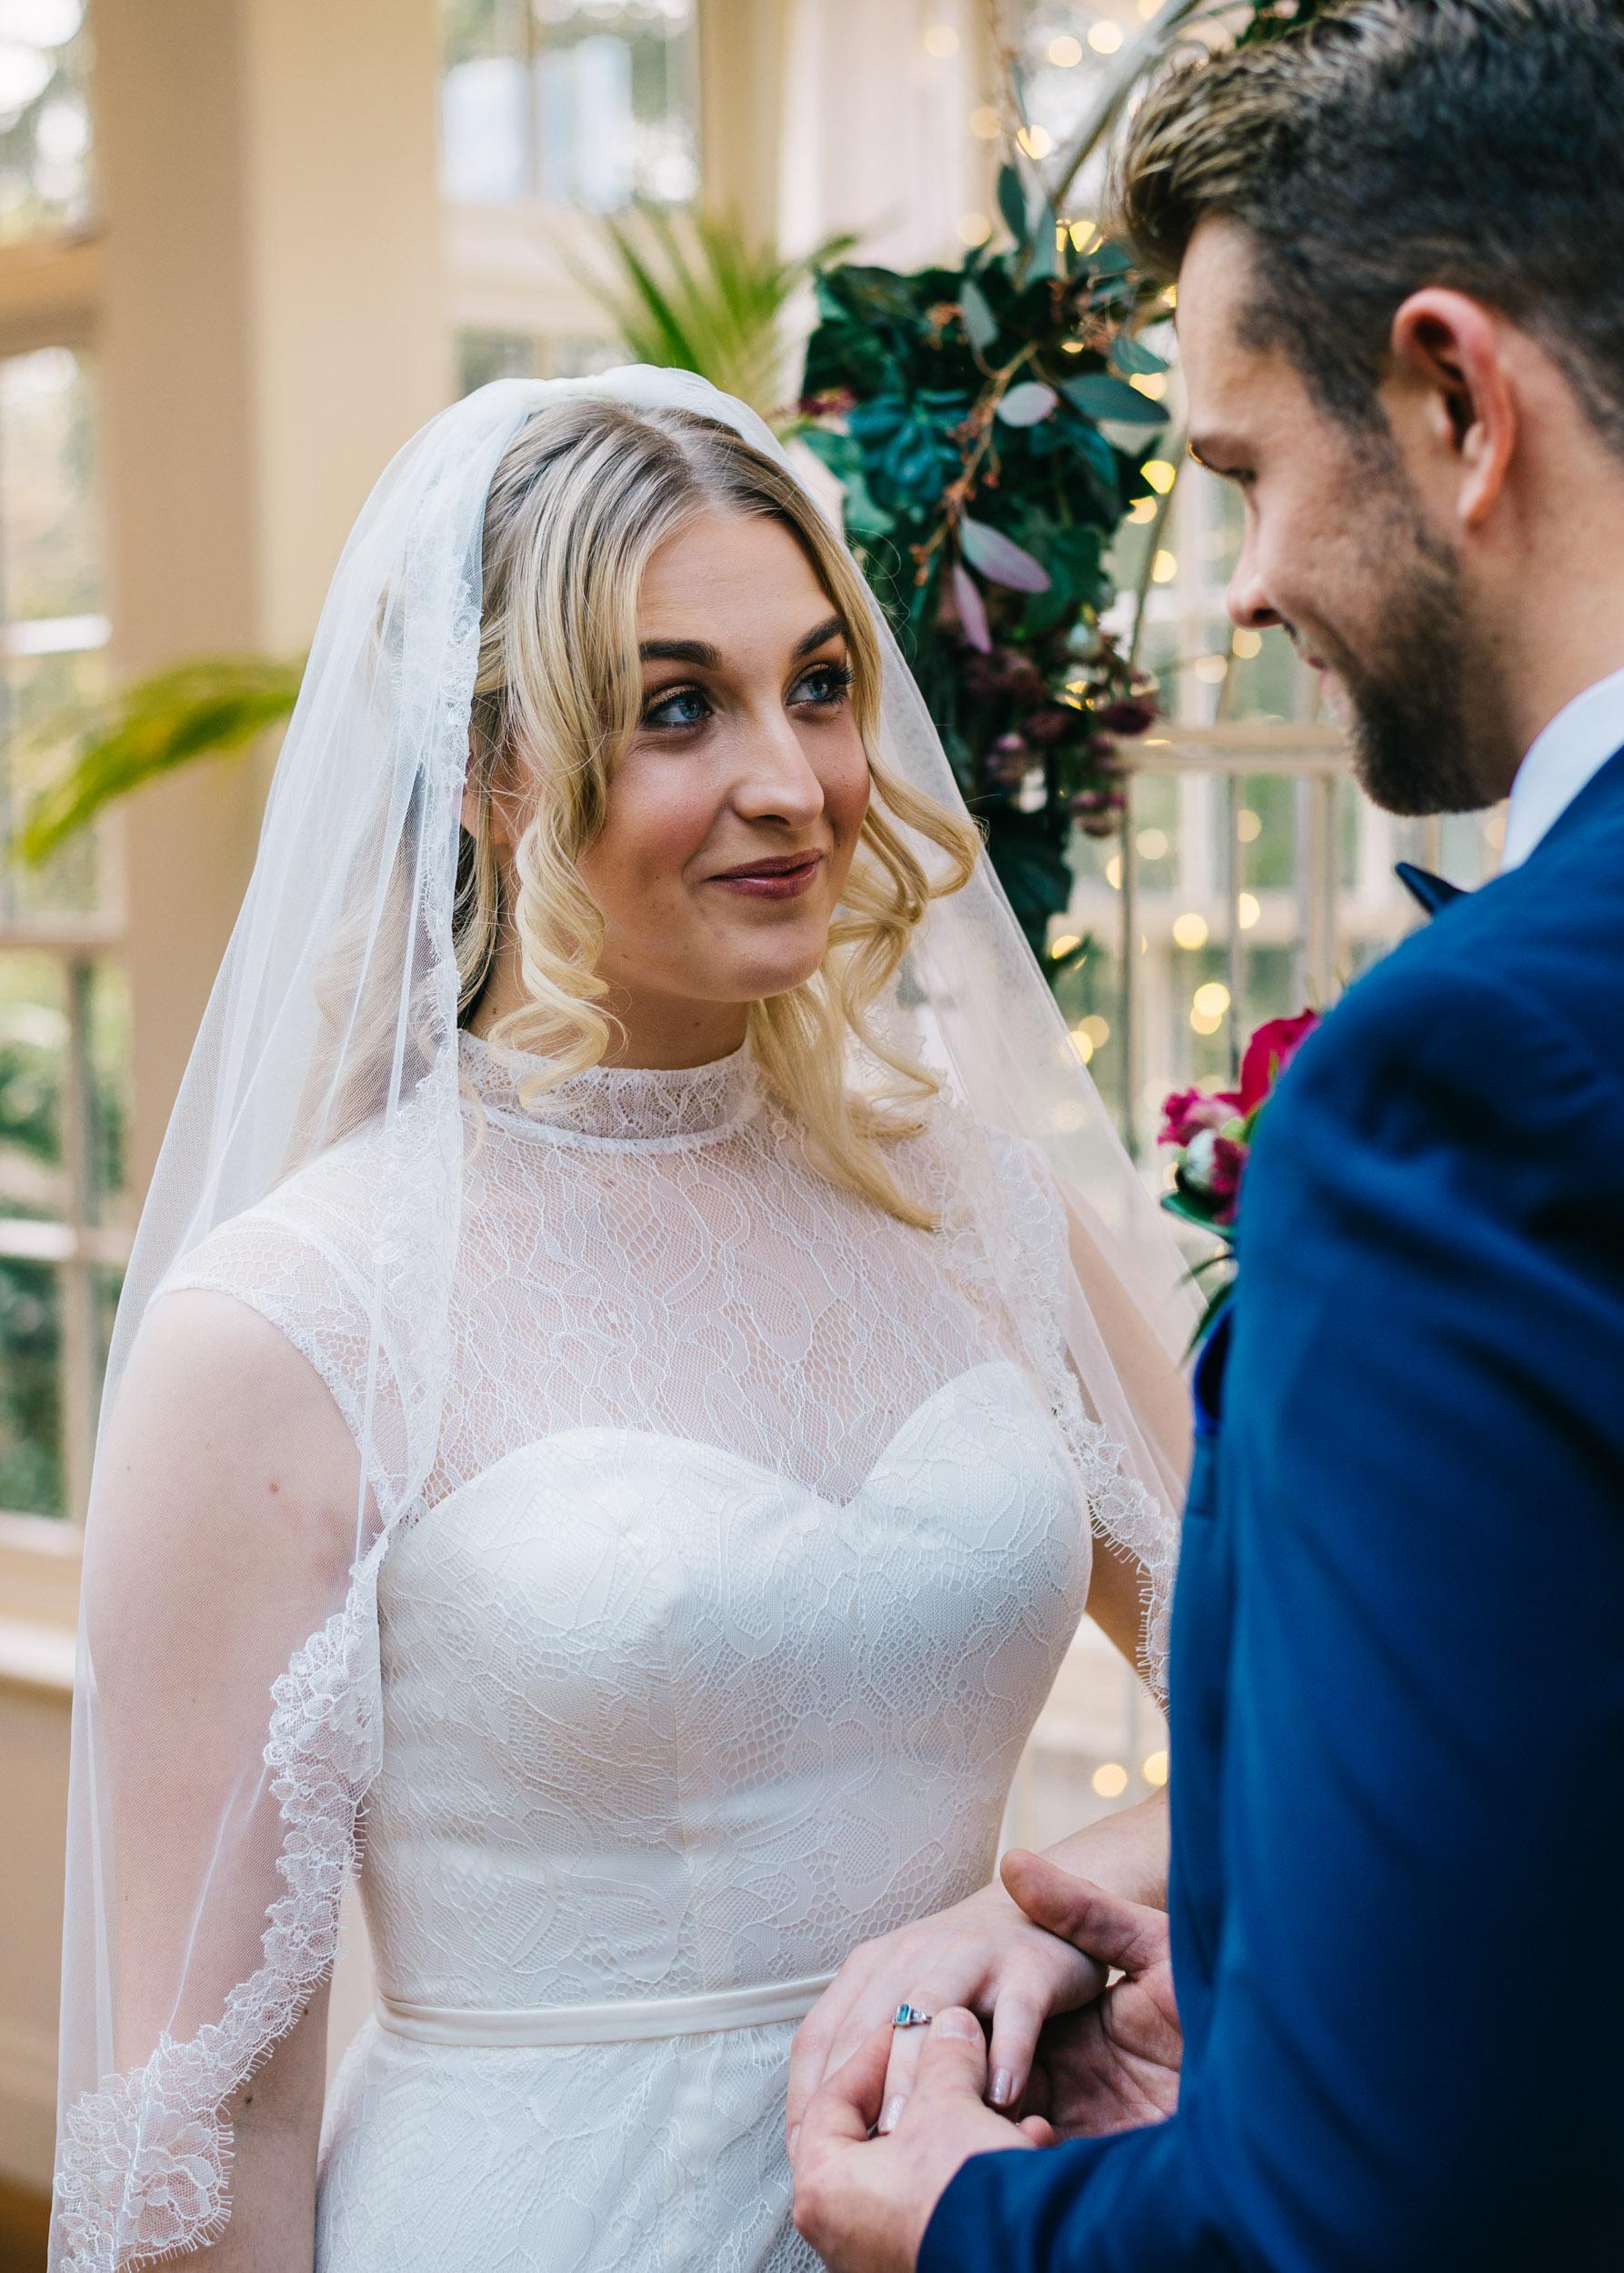 Mitton Hall Wedding Photography- Laura Duggleby Photographer3